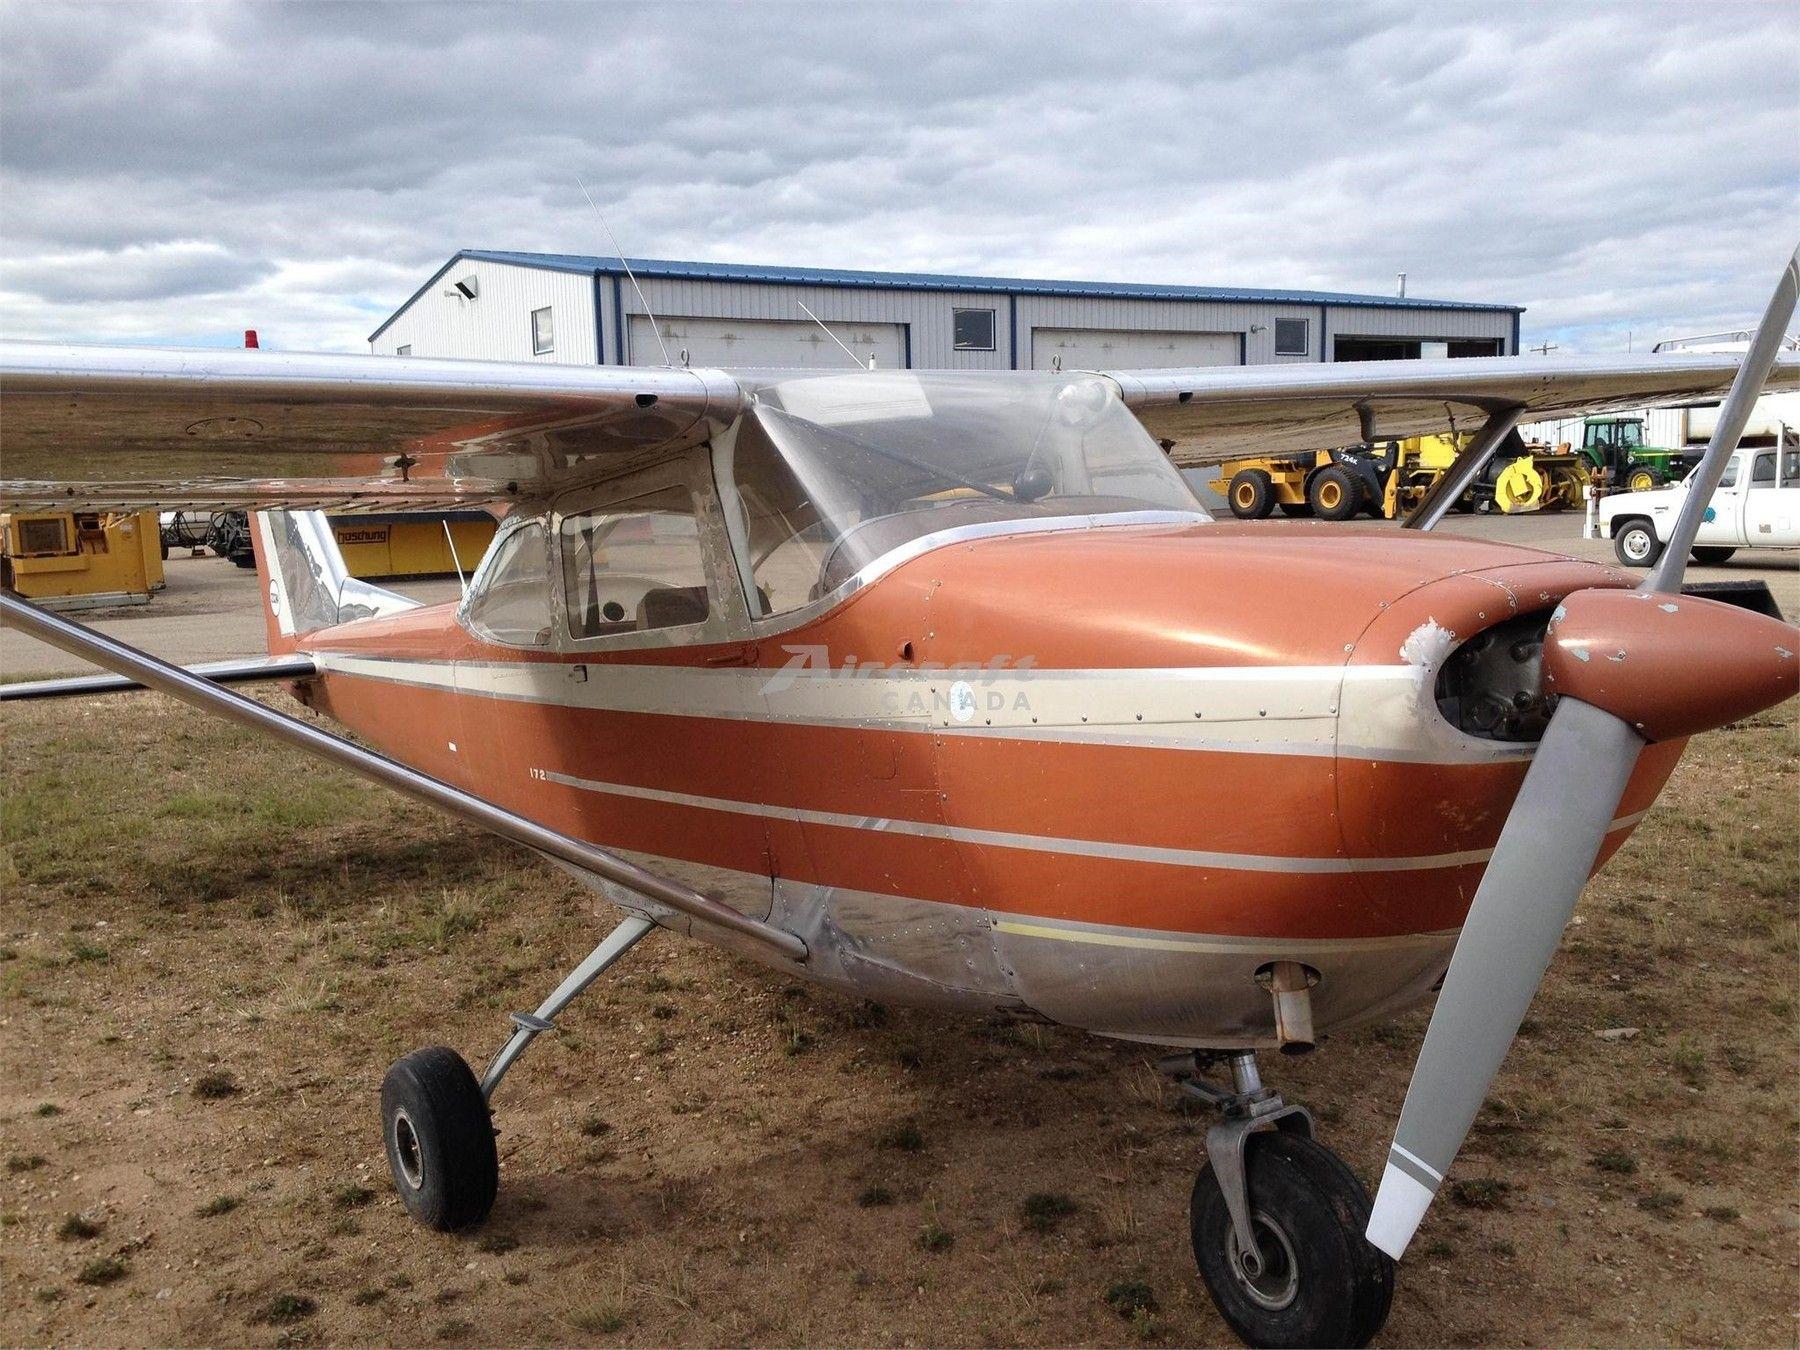 1964 Cessna 172 Skyhawk for sale in Calgary, AB Canada